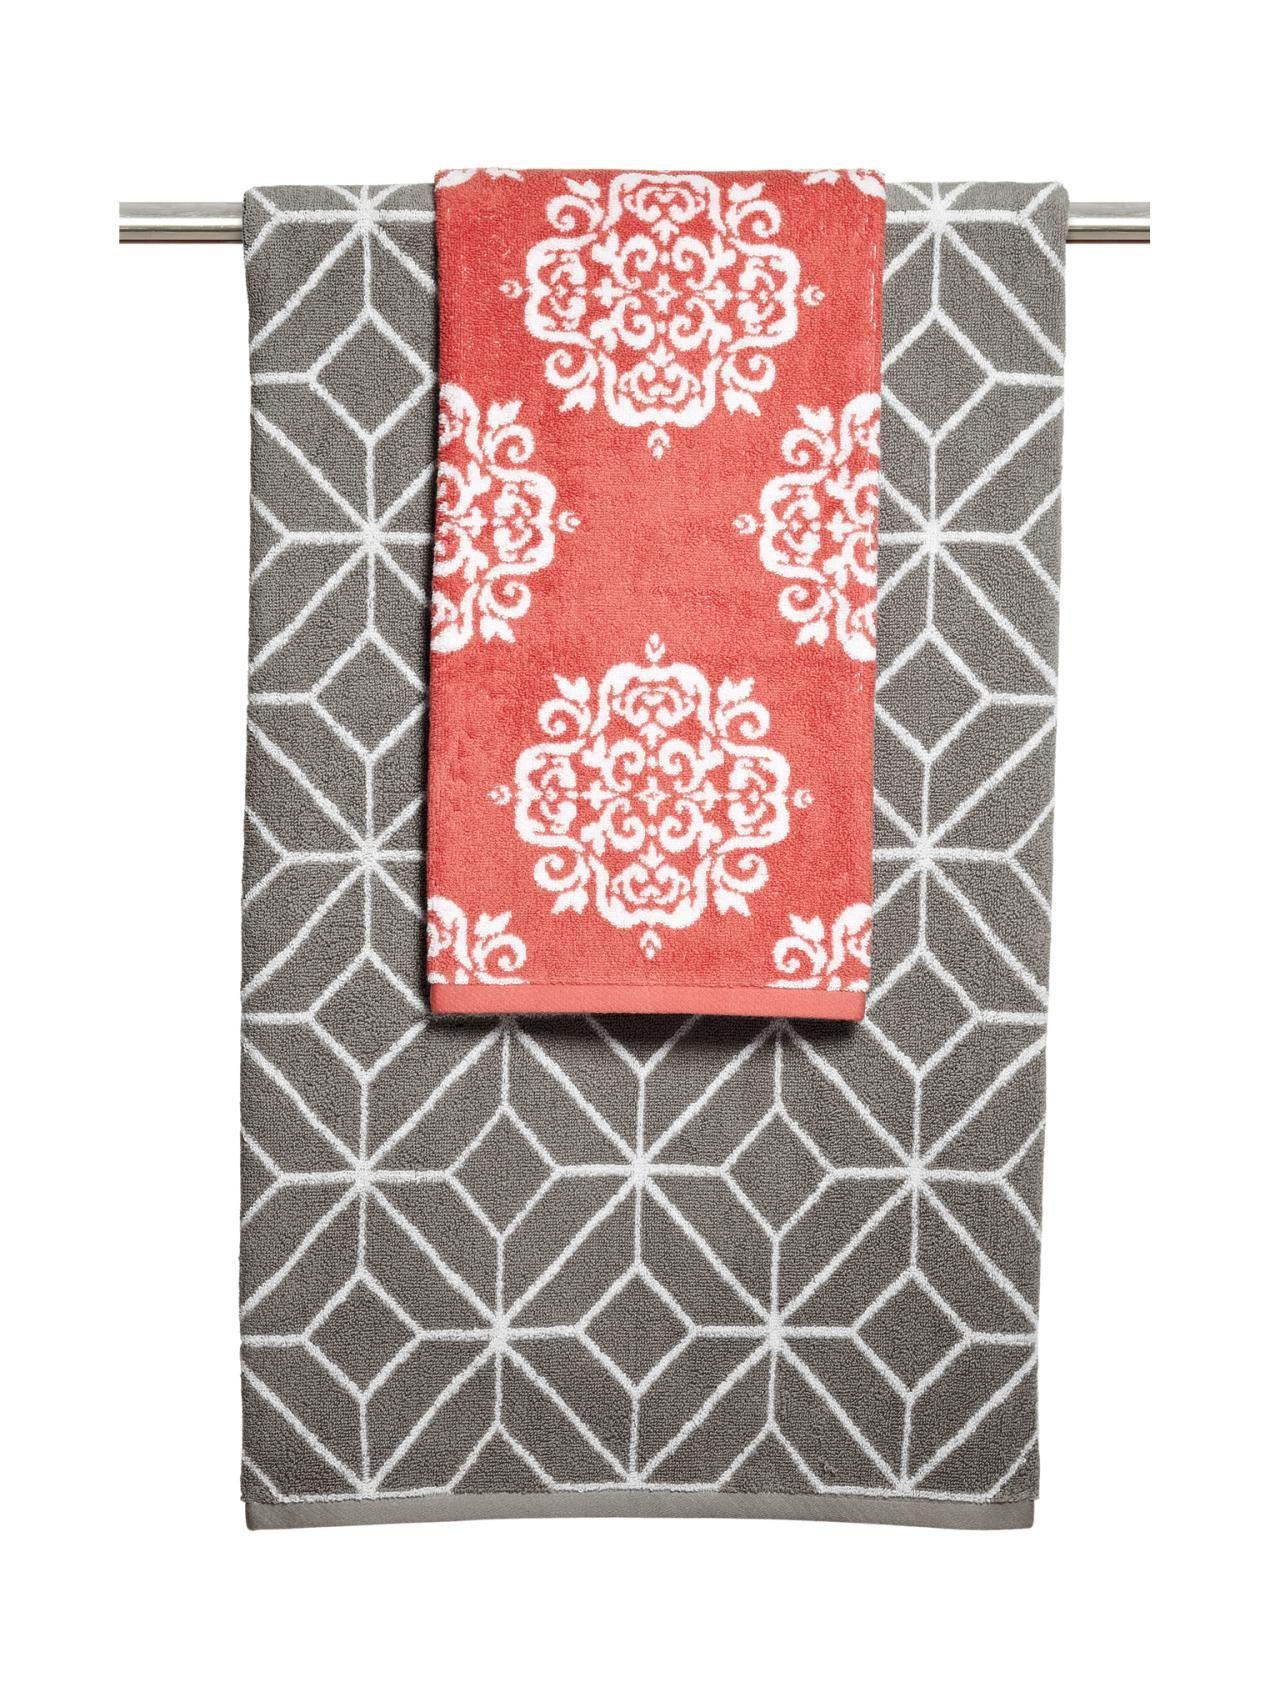 Embellished Bath Towels Cotton Towels Hand Towels And Towels - Personalized bath towels for small bathroom ideas